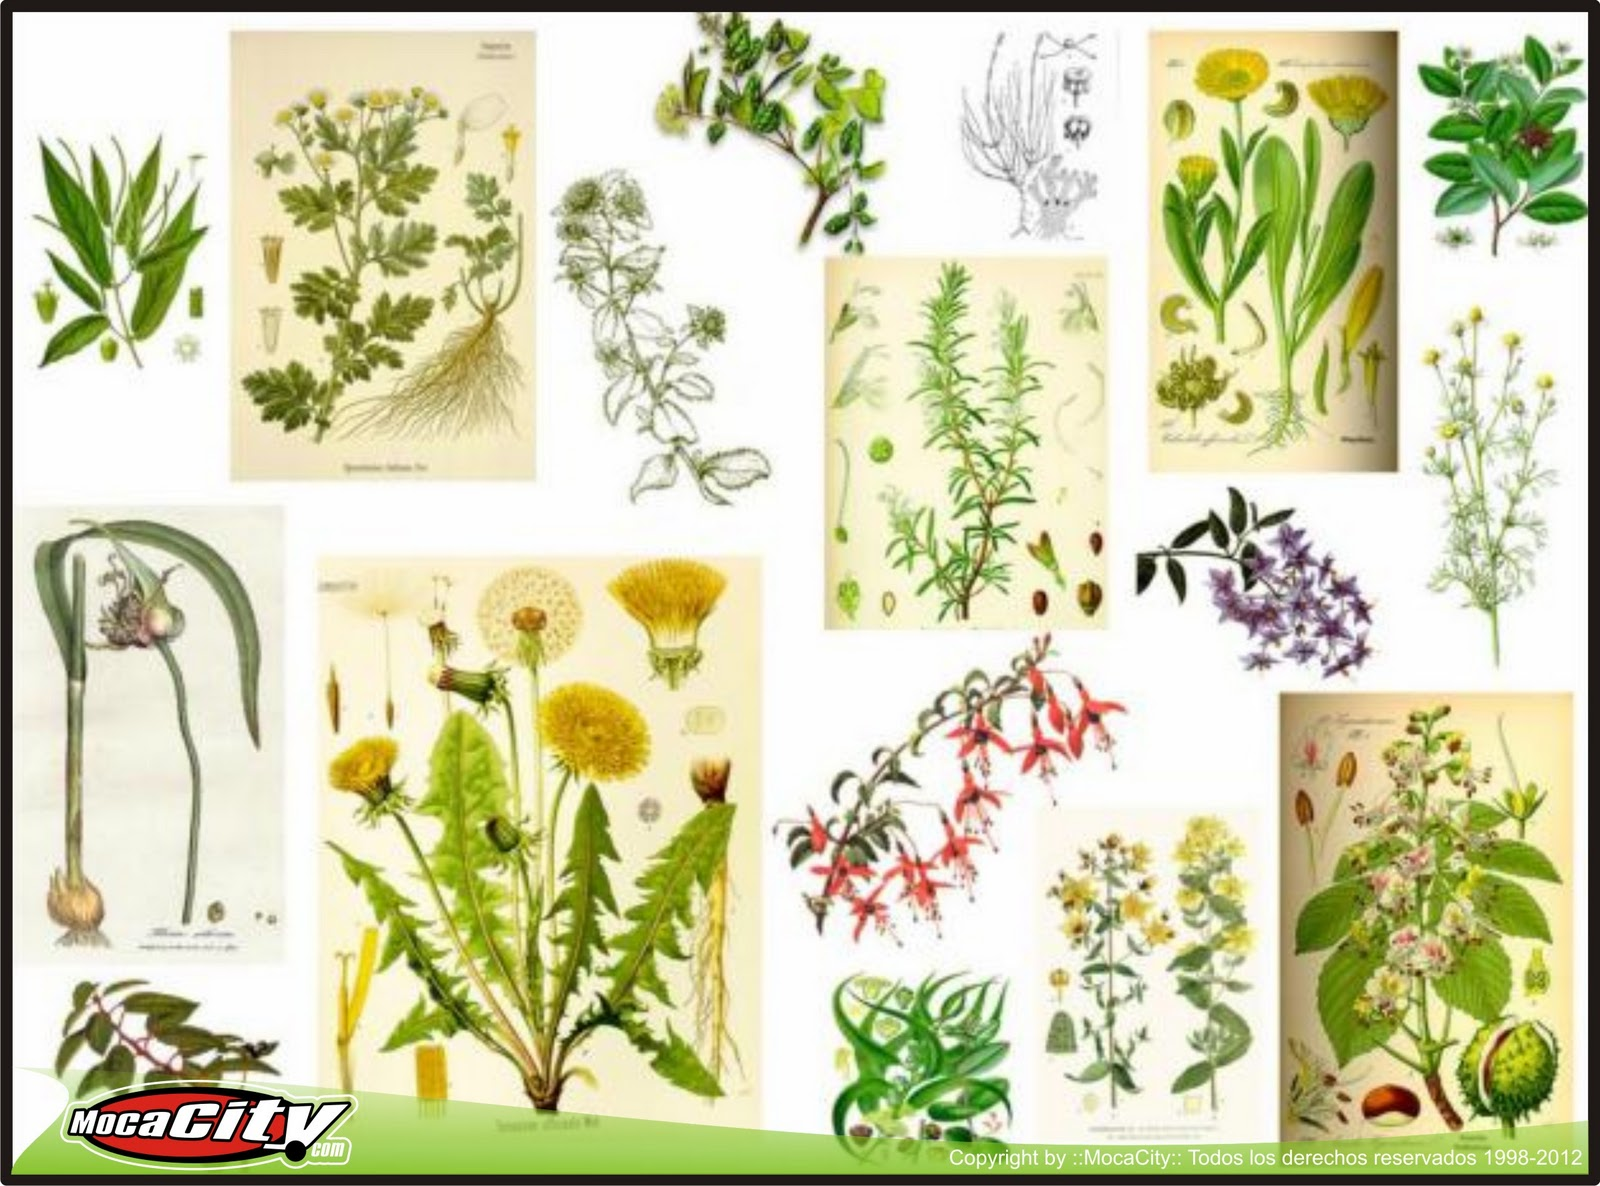 Plantas Foraneas Buscar Con Google Cricut Projects Table Decorations Cricut